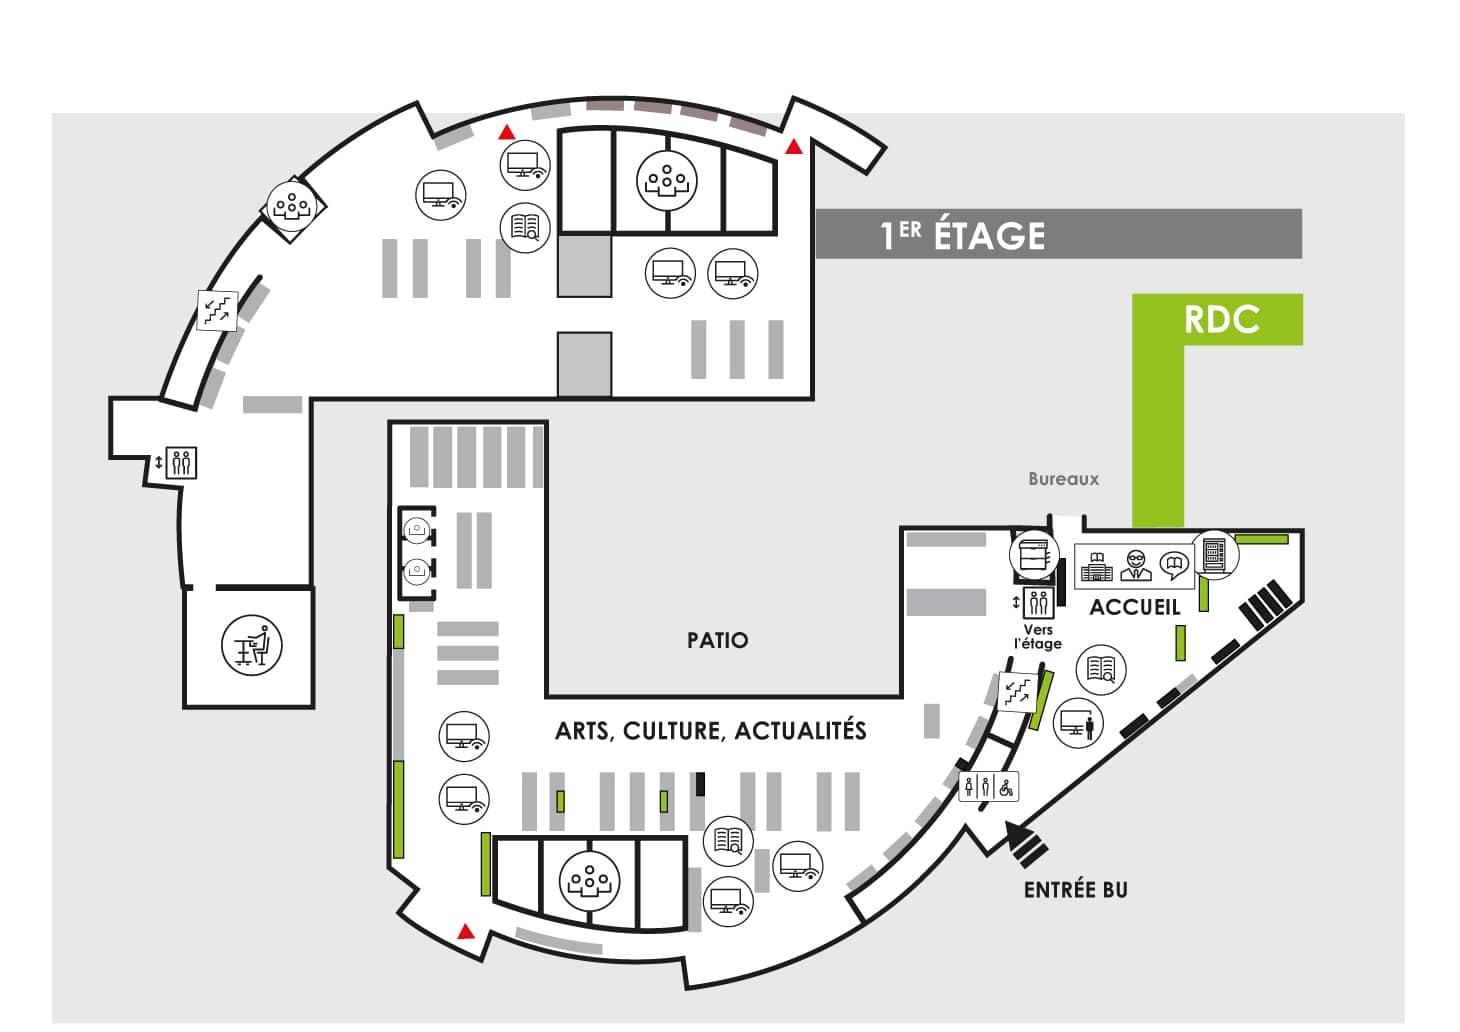 https://visite-bibliotheque-universitaire-ubs.fr/wp-content/uploads/2020/11/Plan-Lorient-ubs-4-A1.jpg